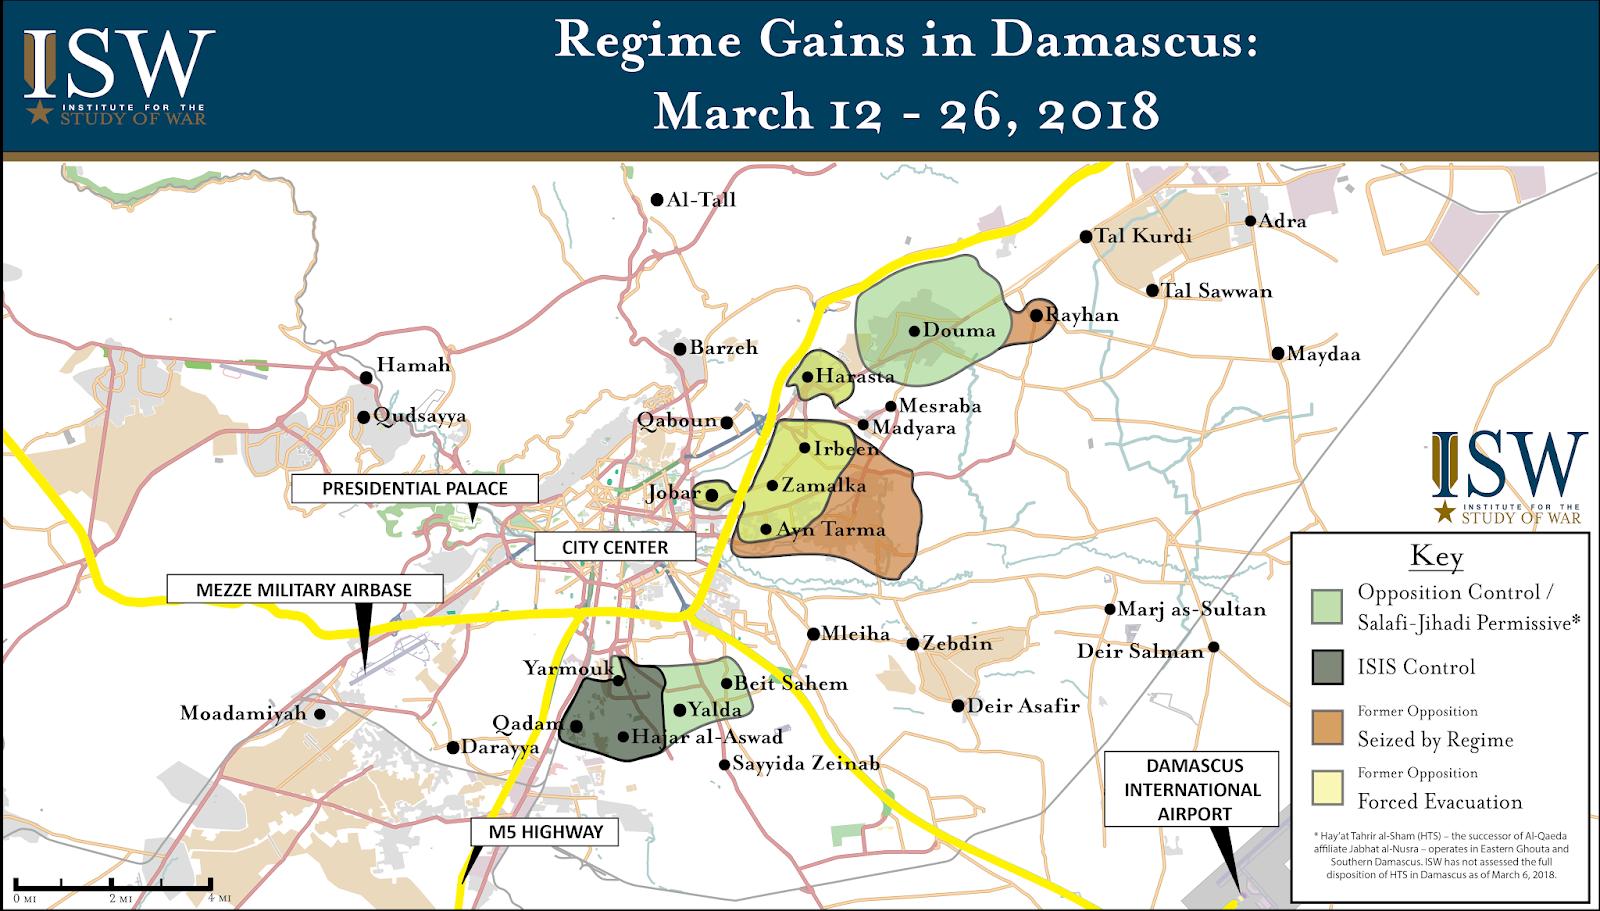 ISW Blog: Regime Gains in Damascus, Syria: March 12 - 26, 2018 on pakistan map, tunis tunisia map, damascus oregon map, asma al-assad, kabul afghanistan map, amman jordan map, baghdad map, world map, jerusalem map, beirut lebanon map, bahrain map, golan heights map, ancient damascus map, istanbul map, damascus steel, middle east map, rome italy map, arabian sea map, bashar al-assad, algiers algeria map, mid east map, damascus citadel, tripoli lebanon map, tel aviv,